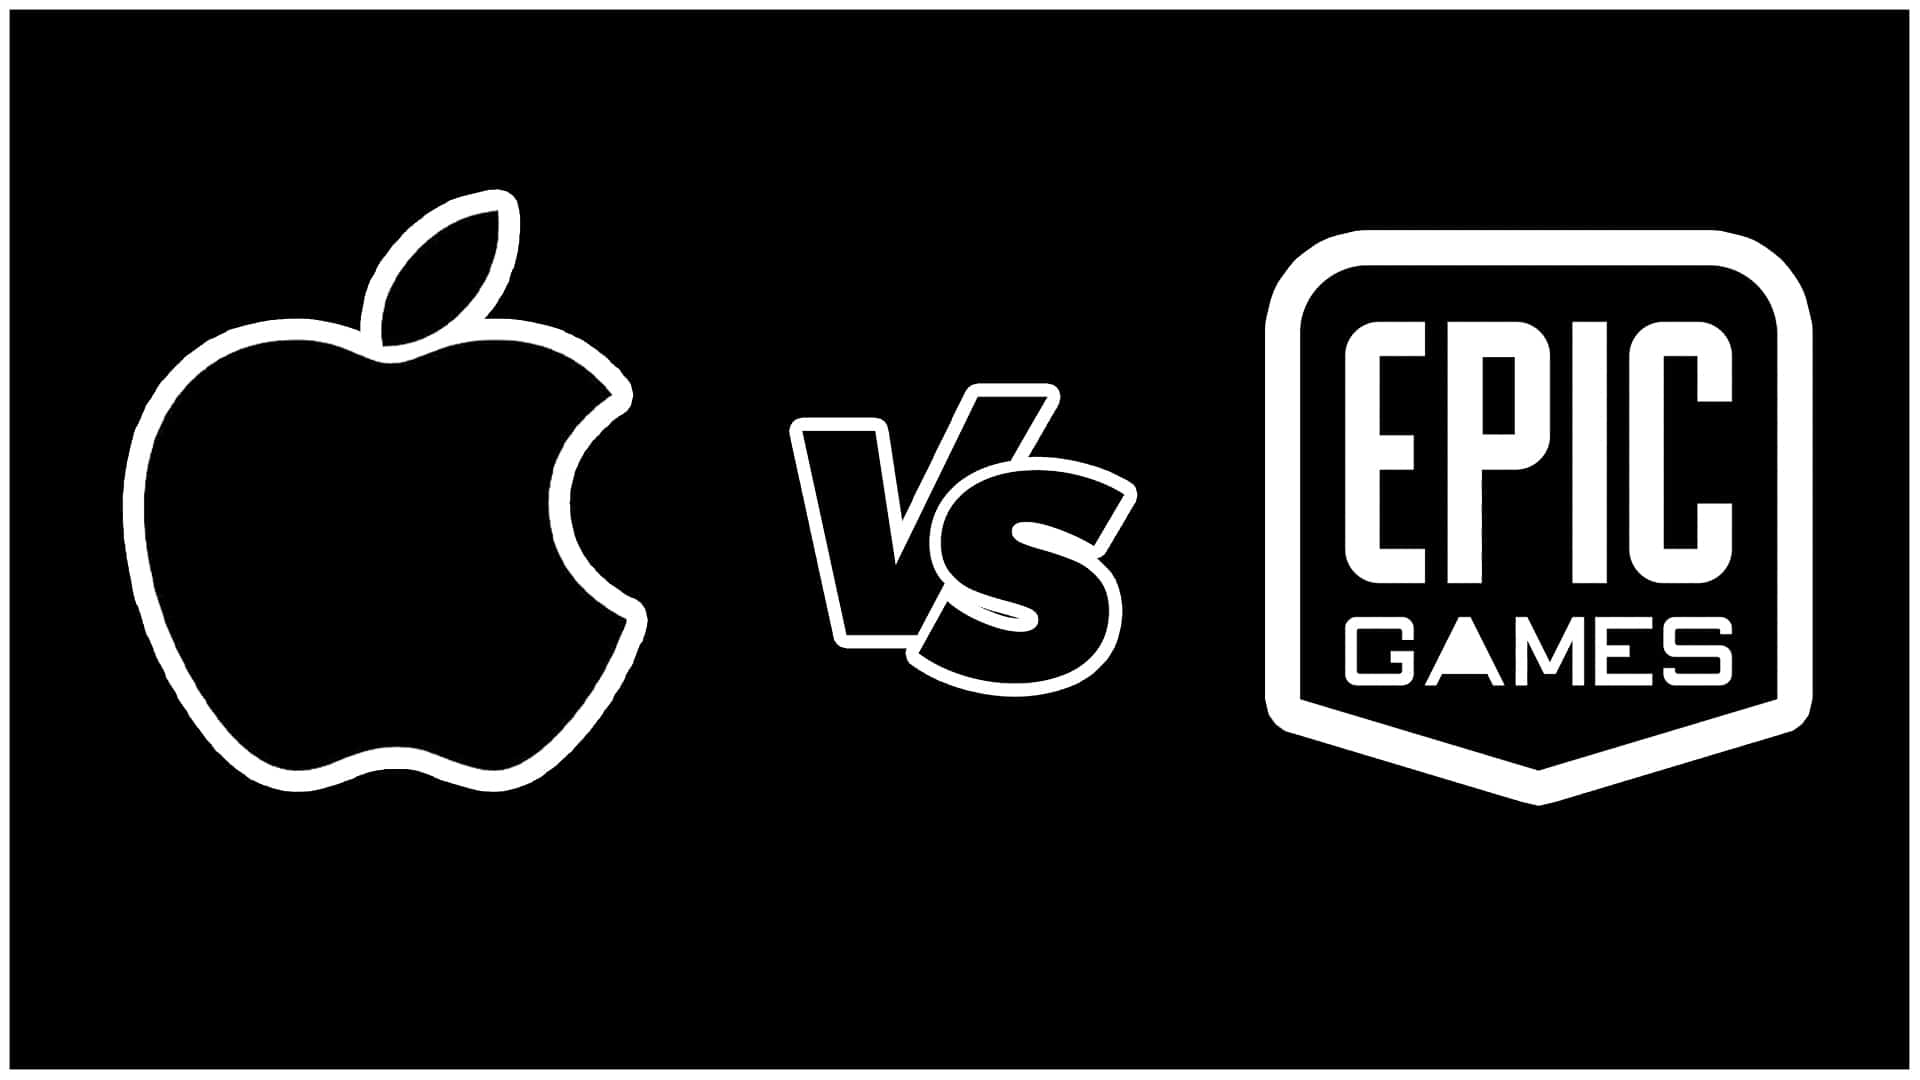 Apple vs. Epic Games